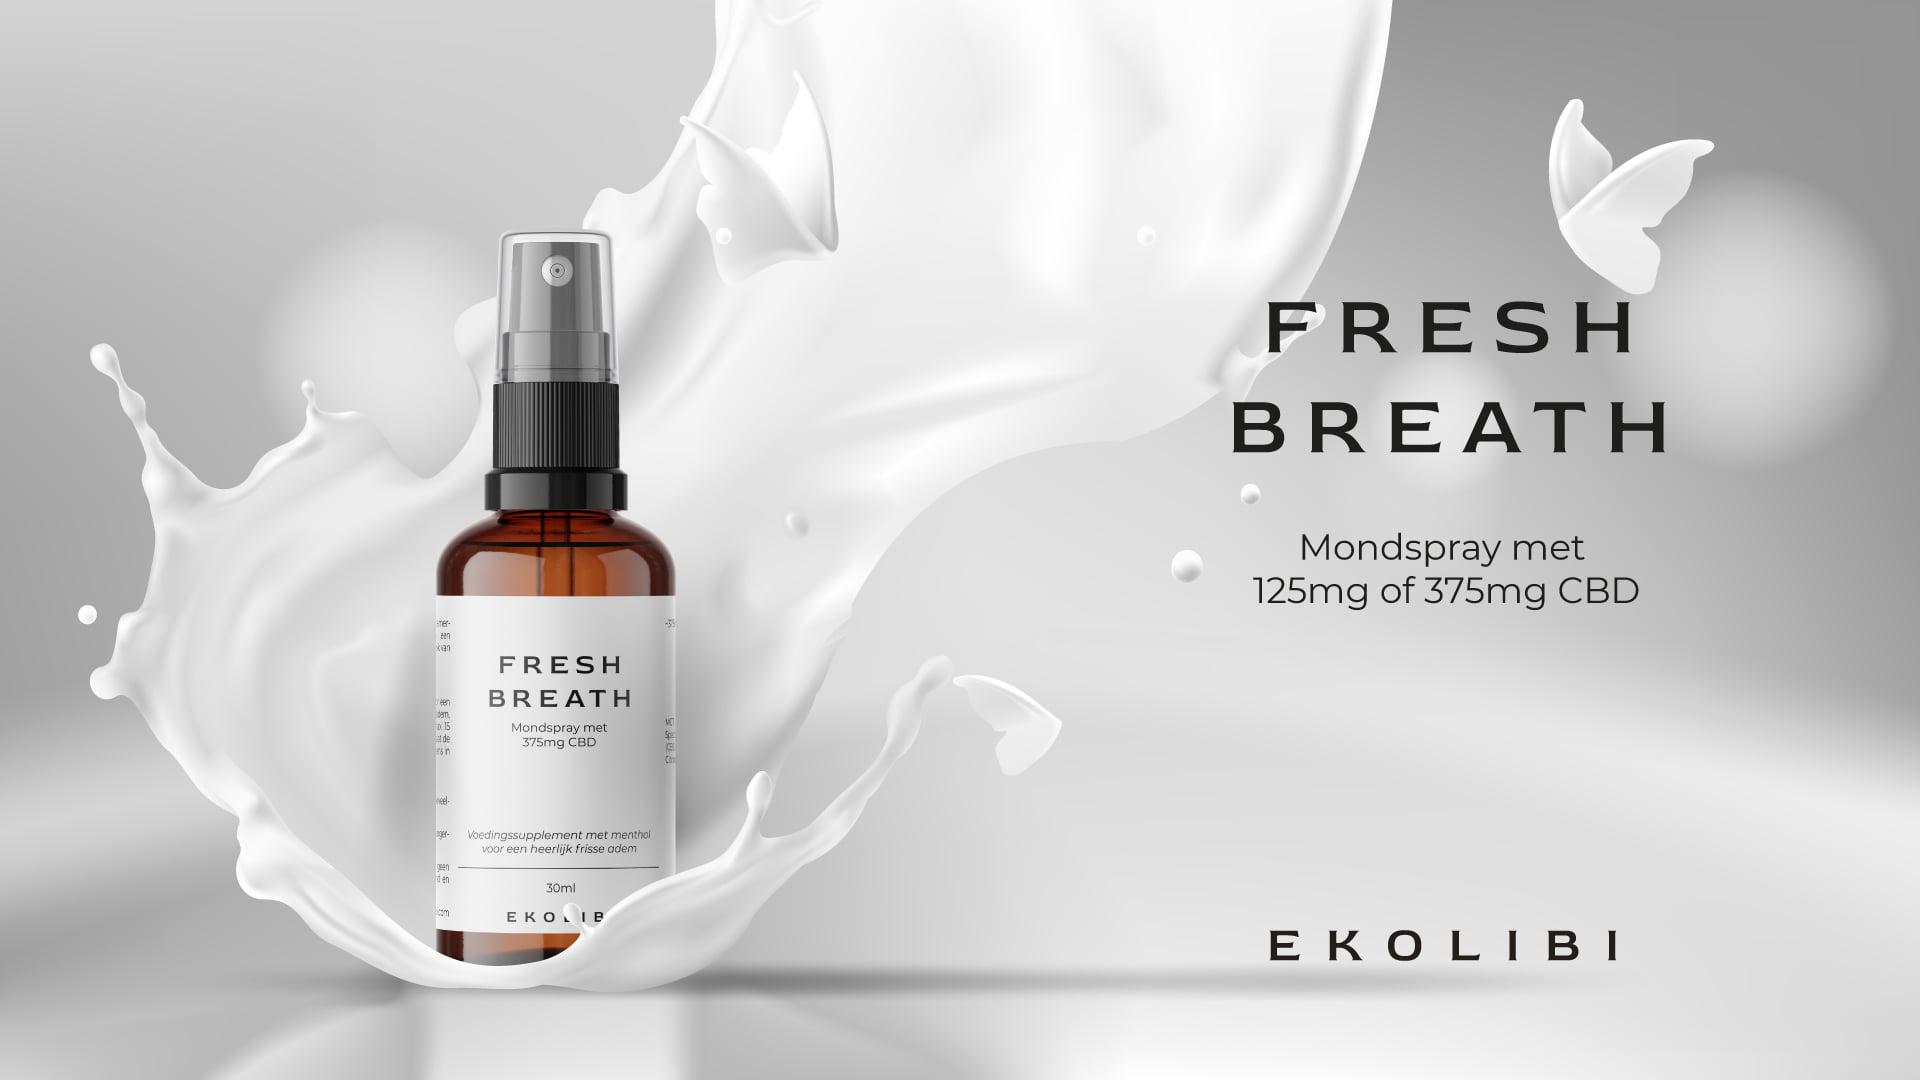 Ekolibi Fresh Breath CBD productpagina